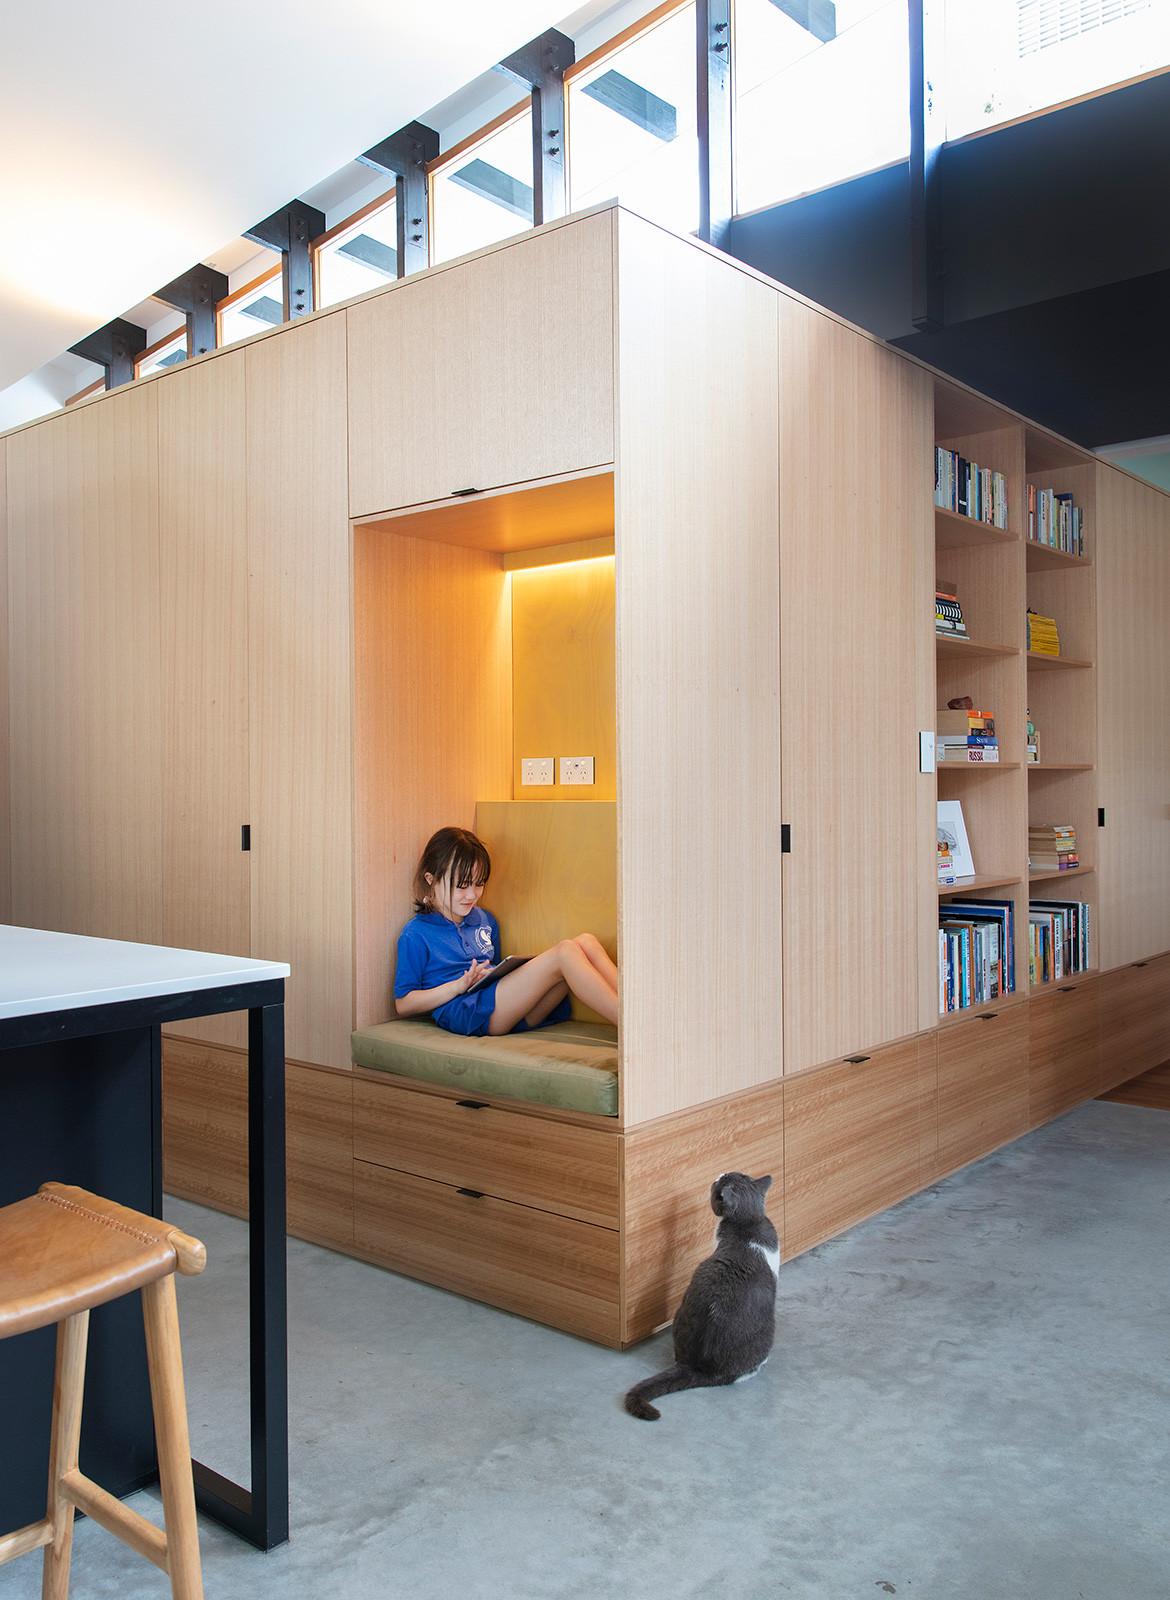 Forrest Street Philip Stejskal Architecture CC Bo Wong reading corner